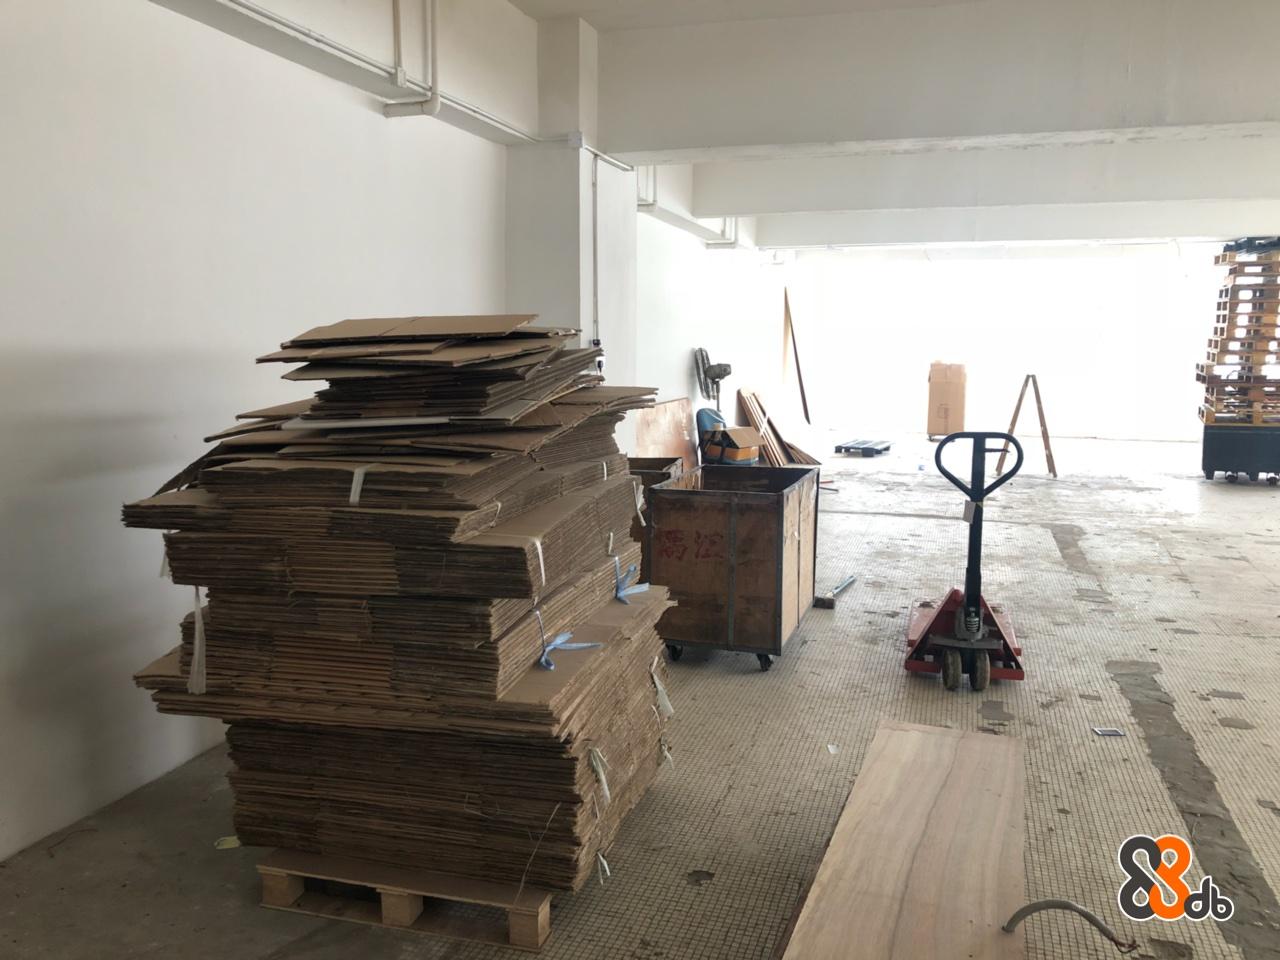 Hardwood,Wood,Wood flooring,Floor,Sculpture